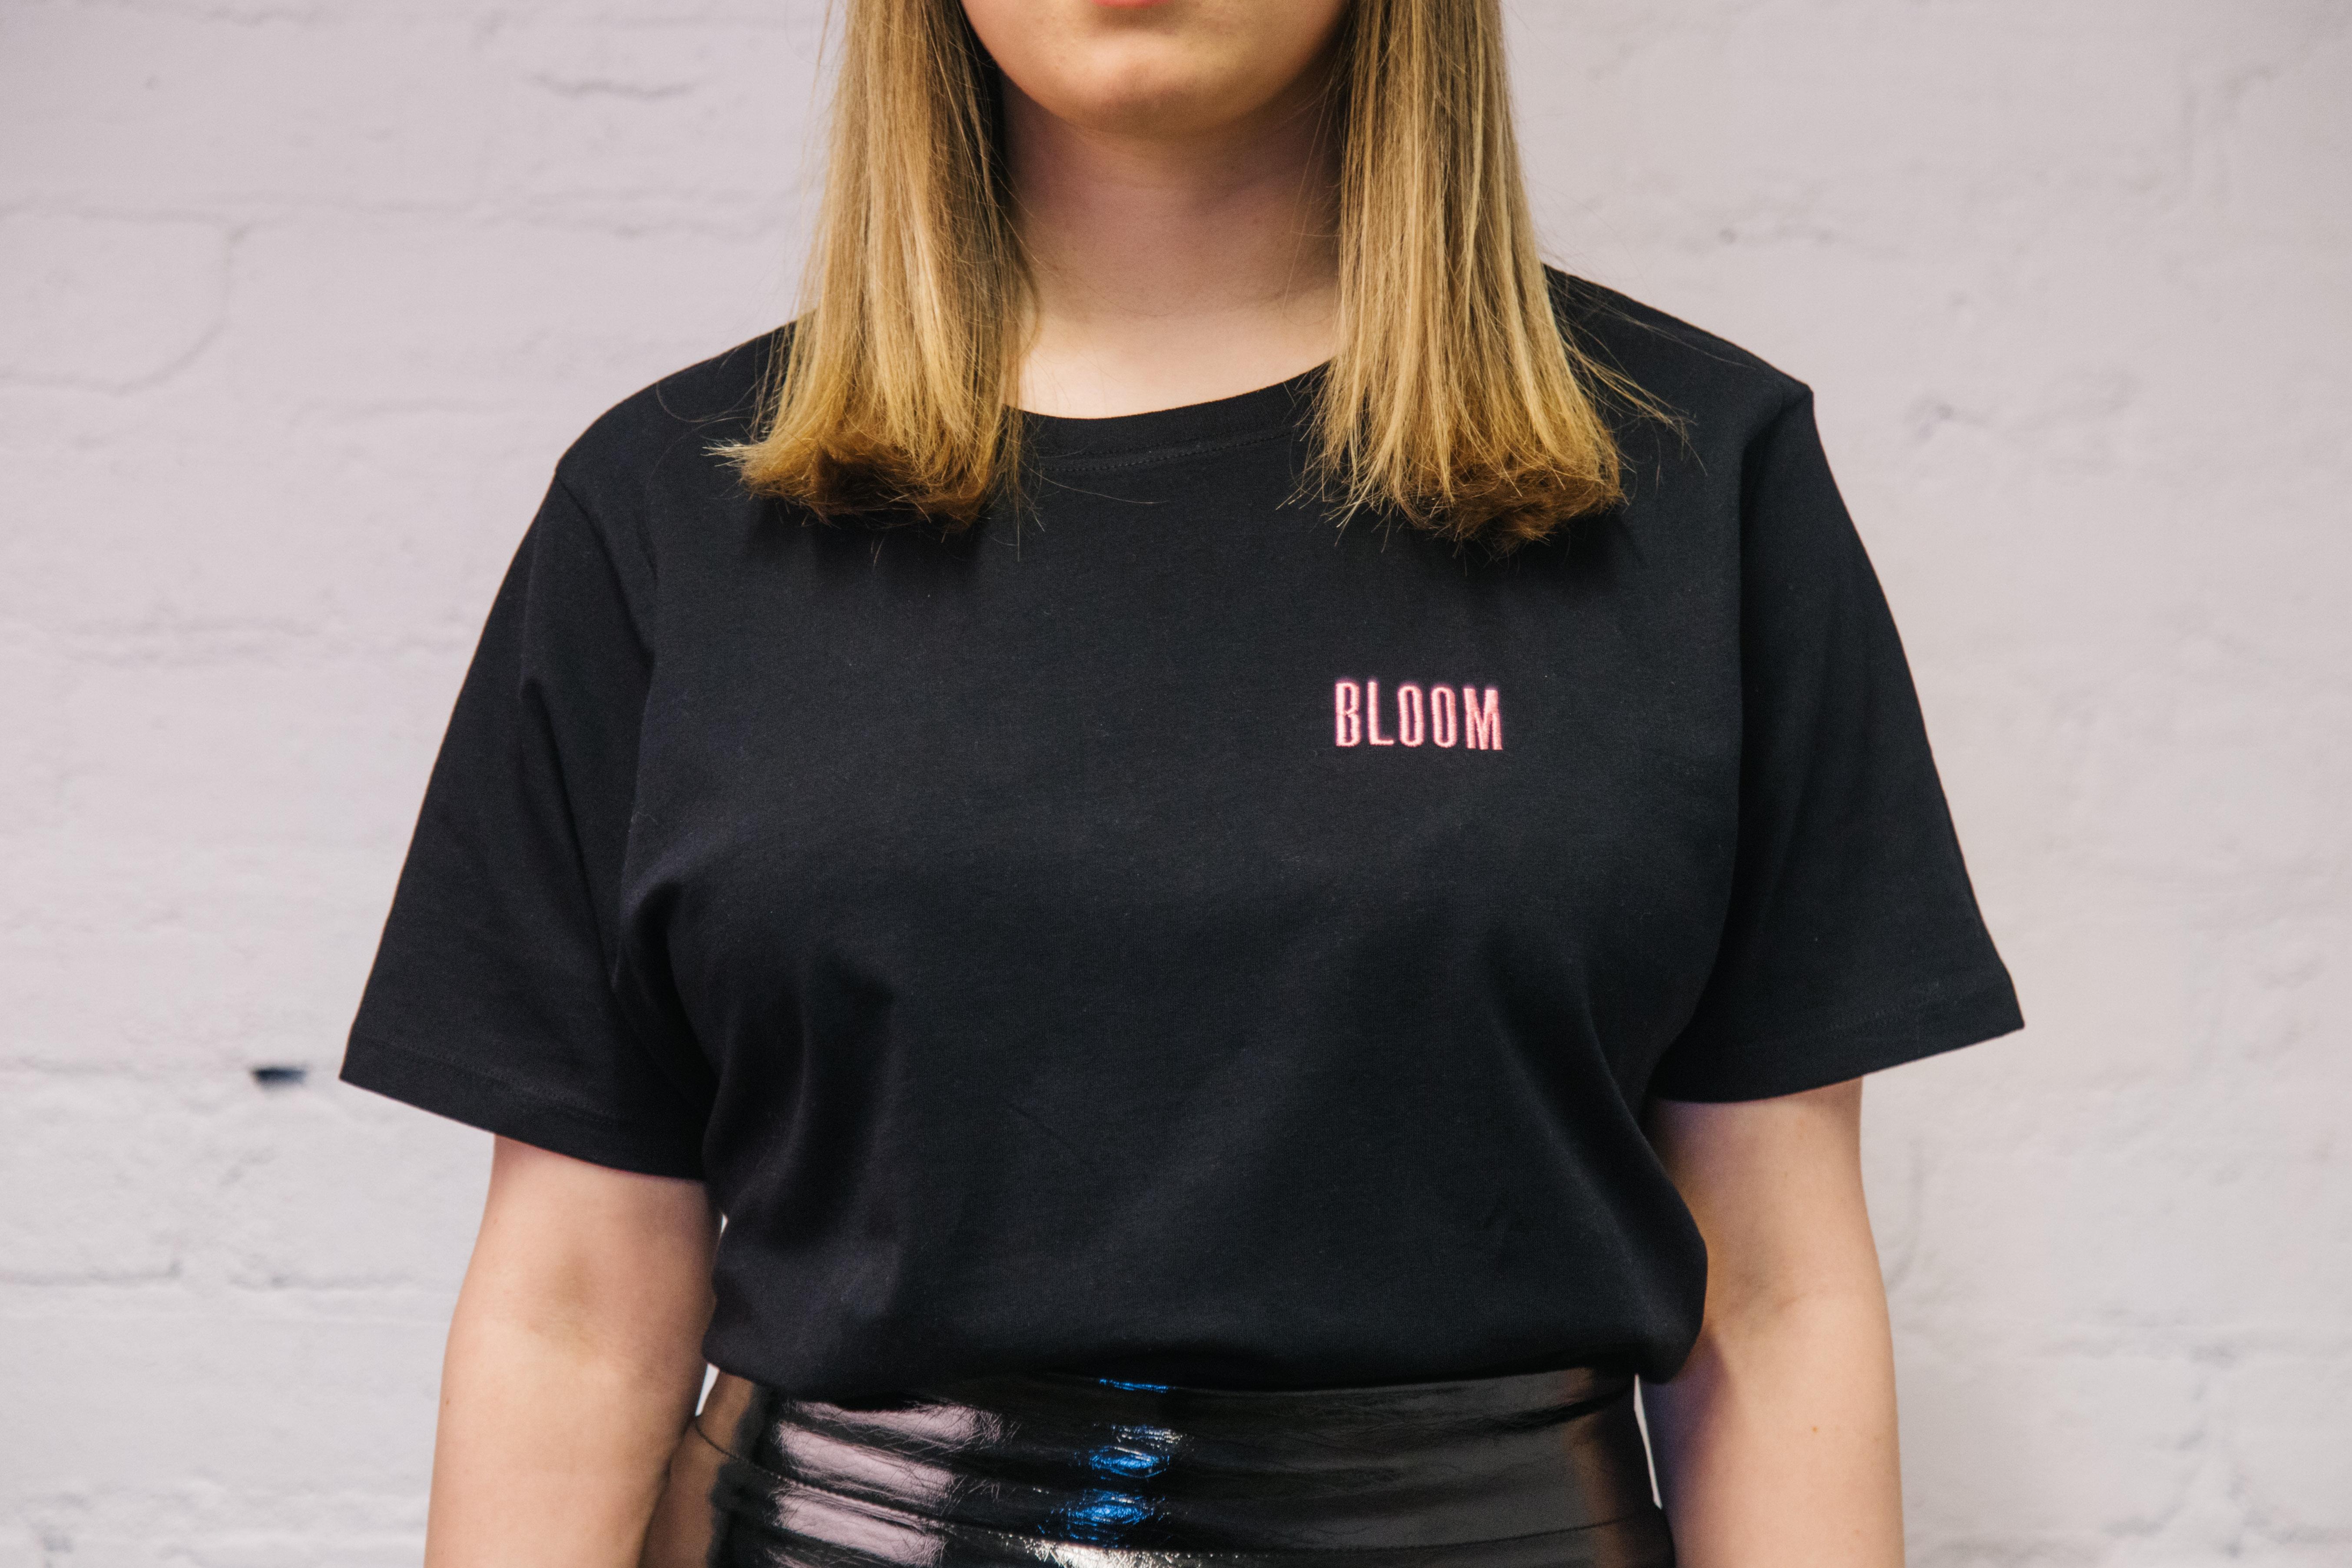 Bloom - Black T-Shirt - Lewis Capaldi